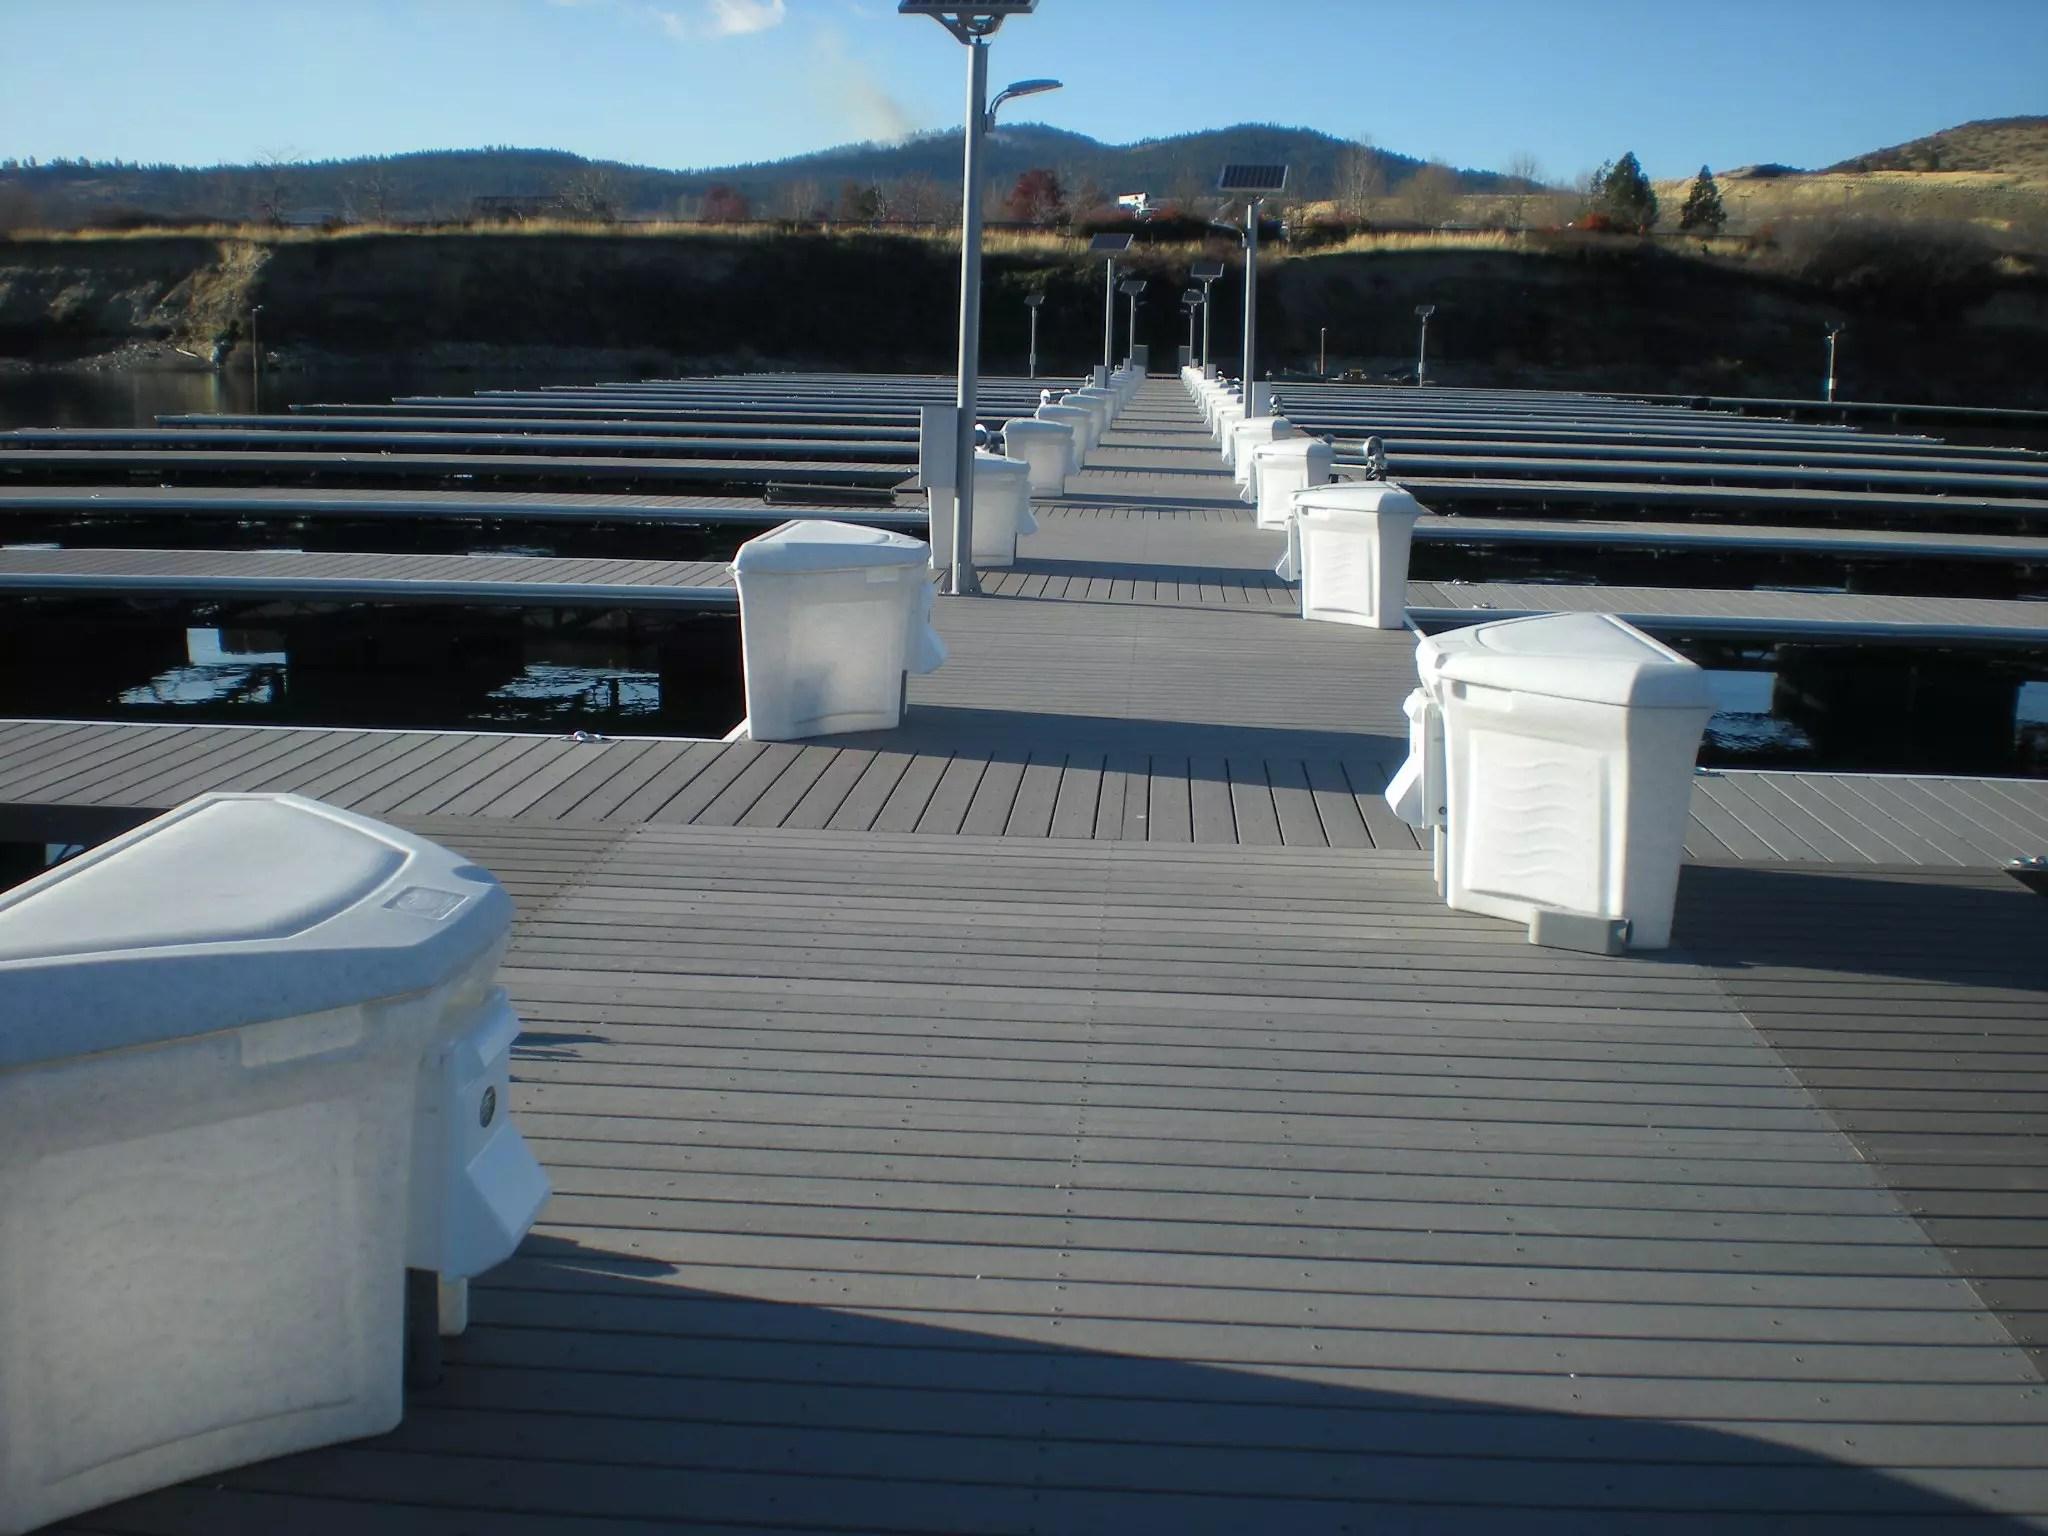 Pedestal For Dock Wiring Diagram L Dock Spc T Shore Power